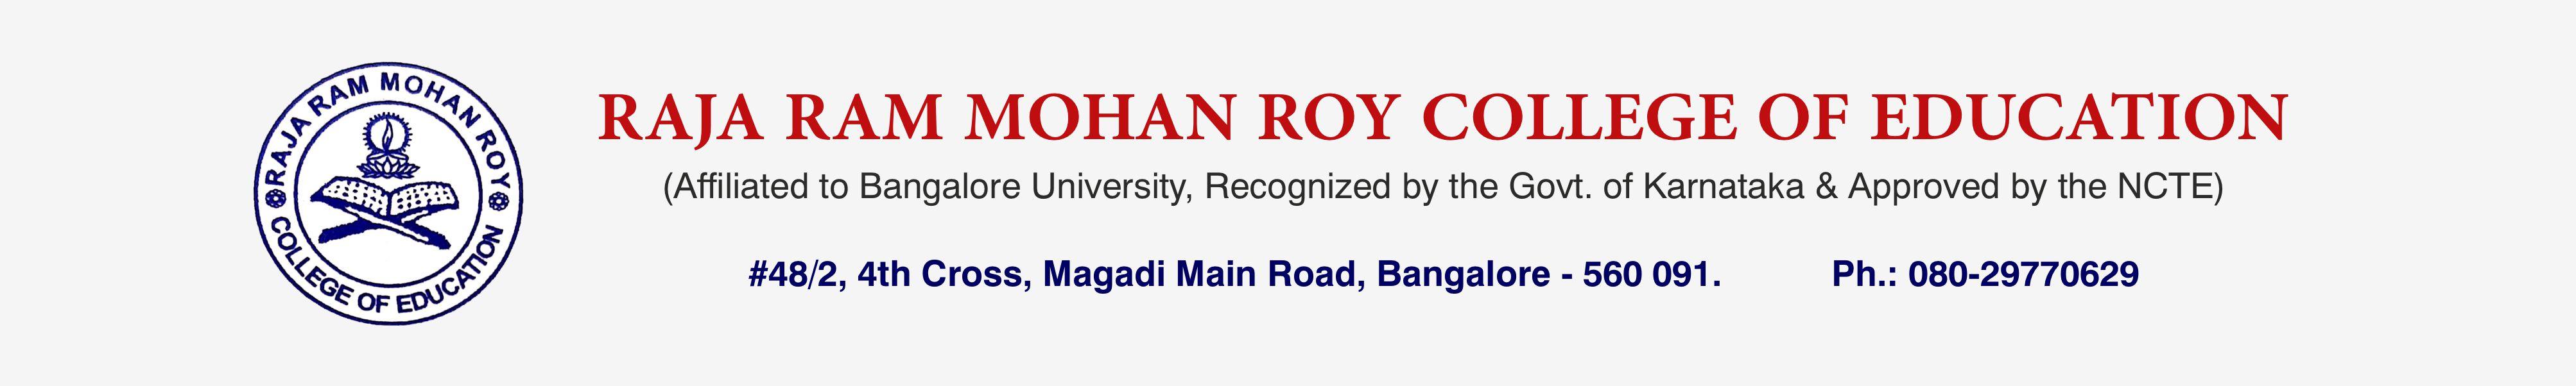 RAJA RAM MOHAN ROY COLLEGE OF EDUCATION